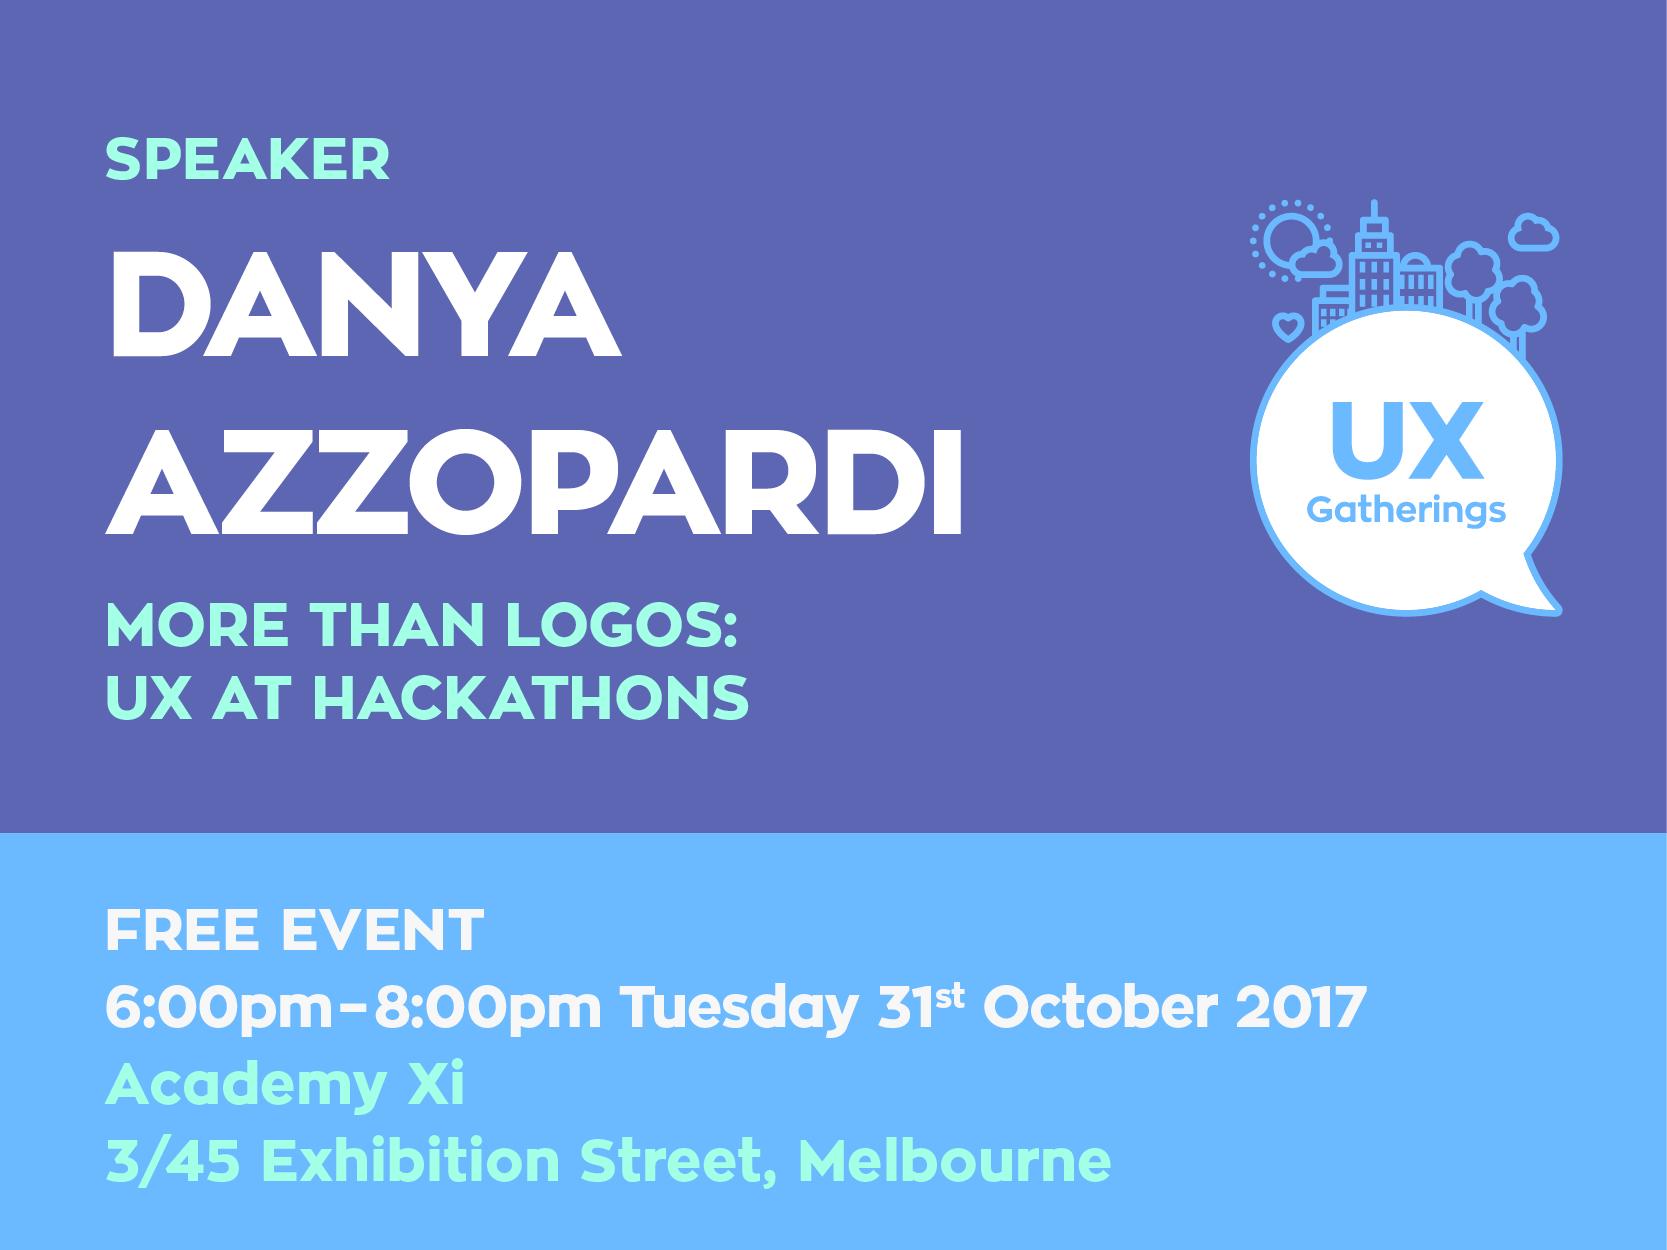 Danya Azzopardi - More Than Logos